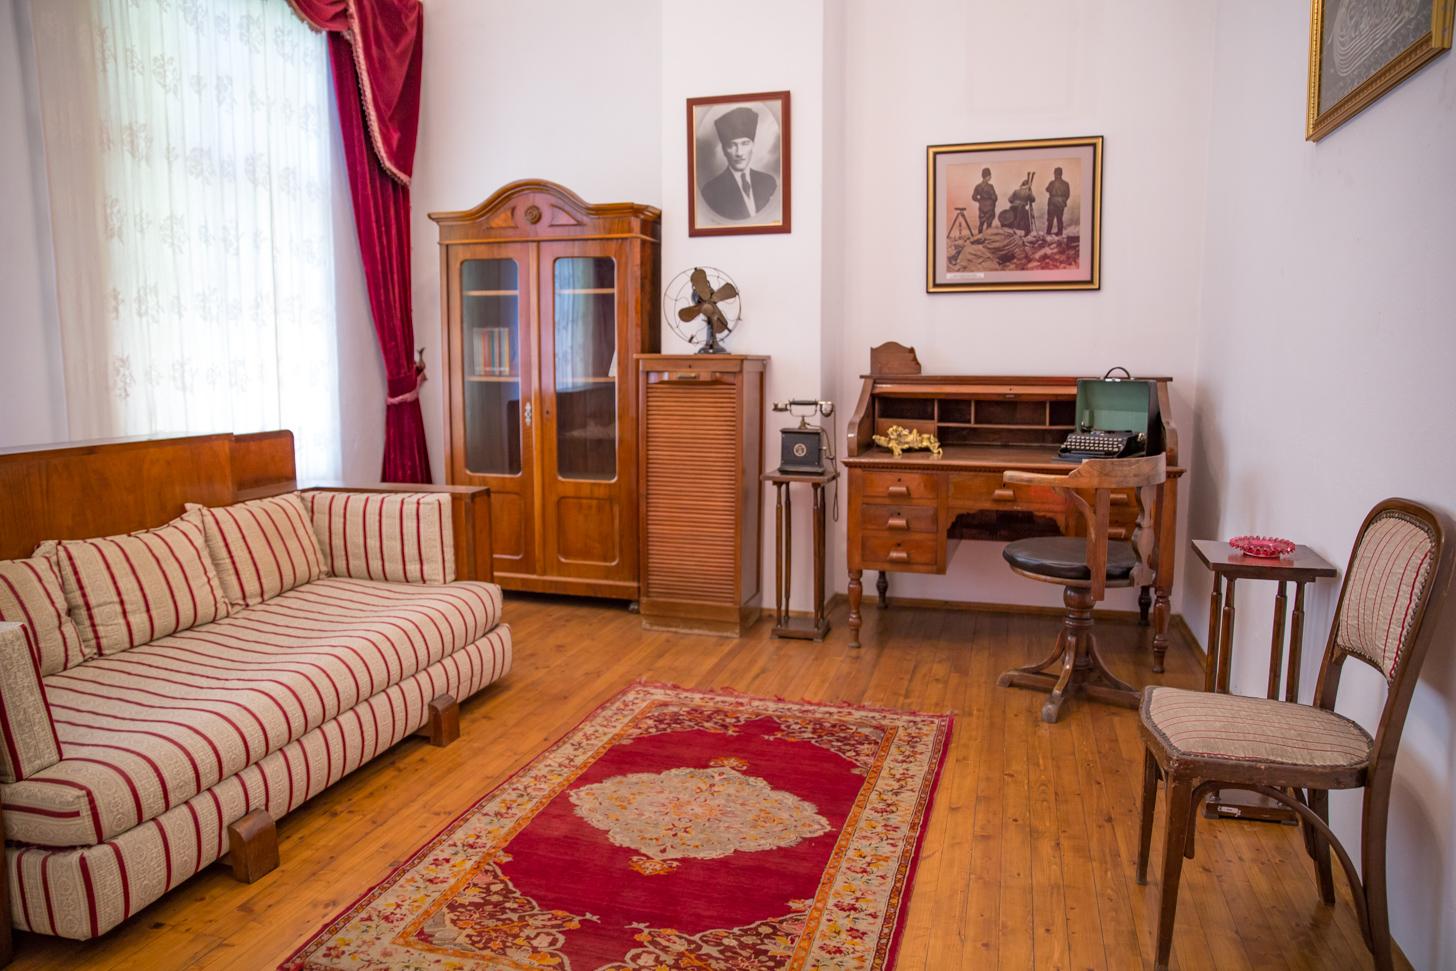 Atatürks House Museum